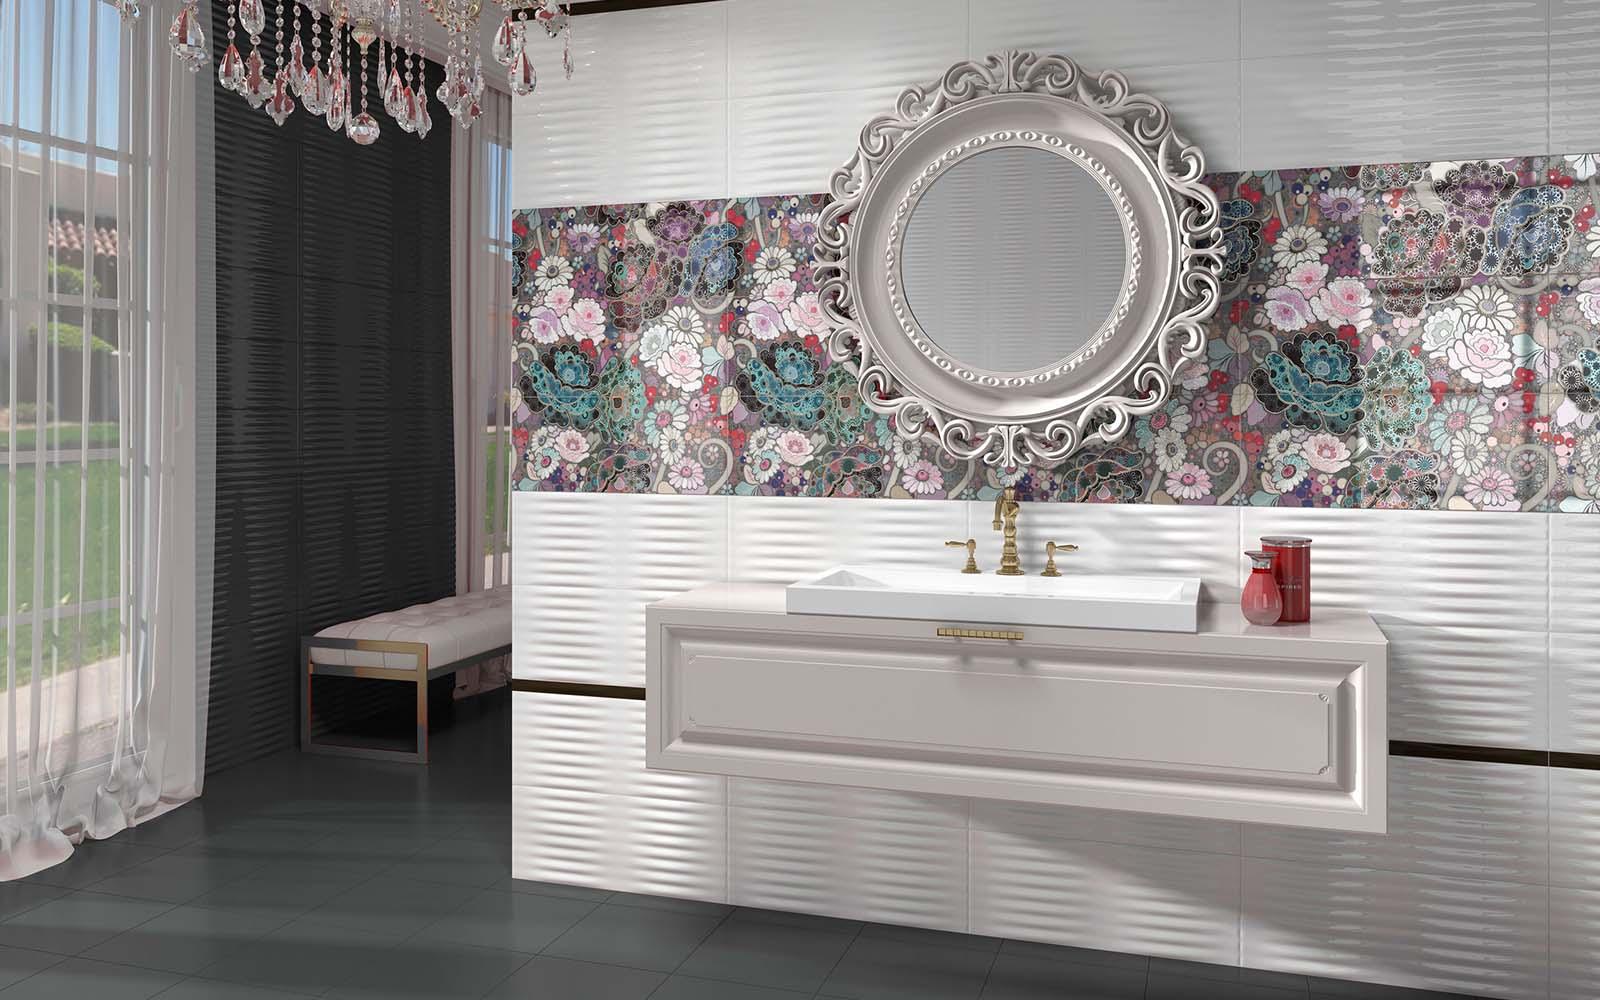 bath room #1